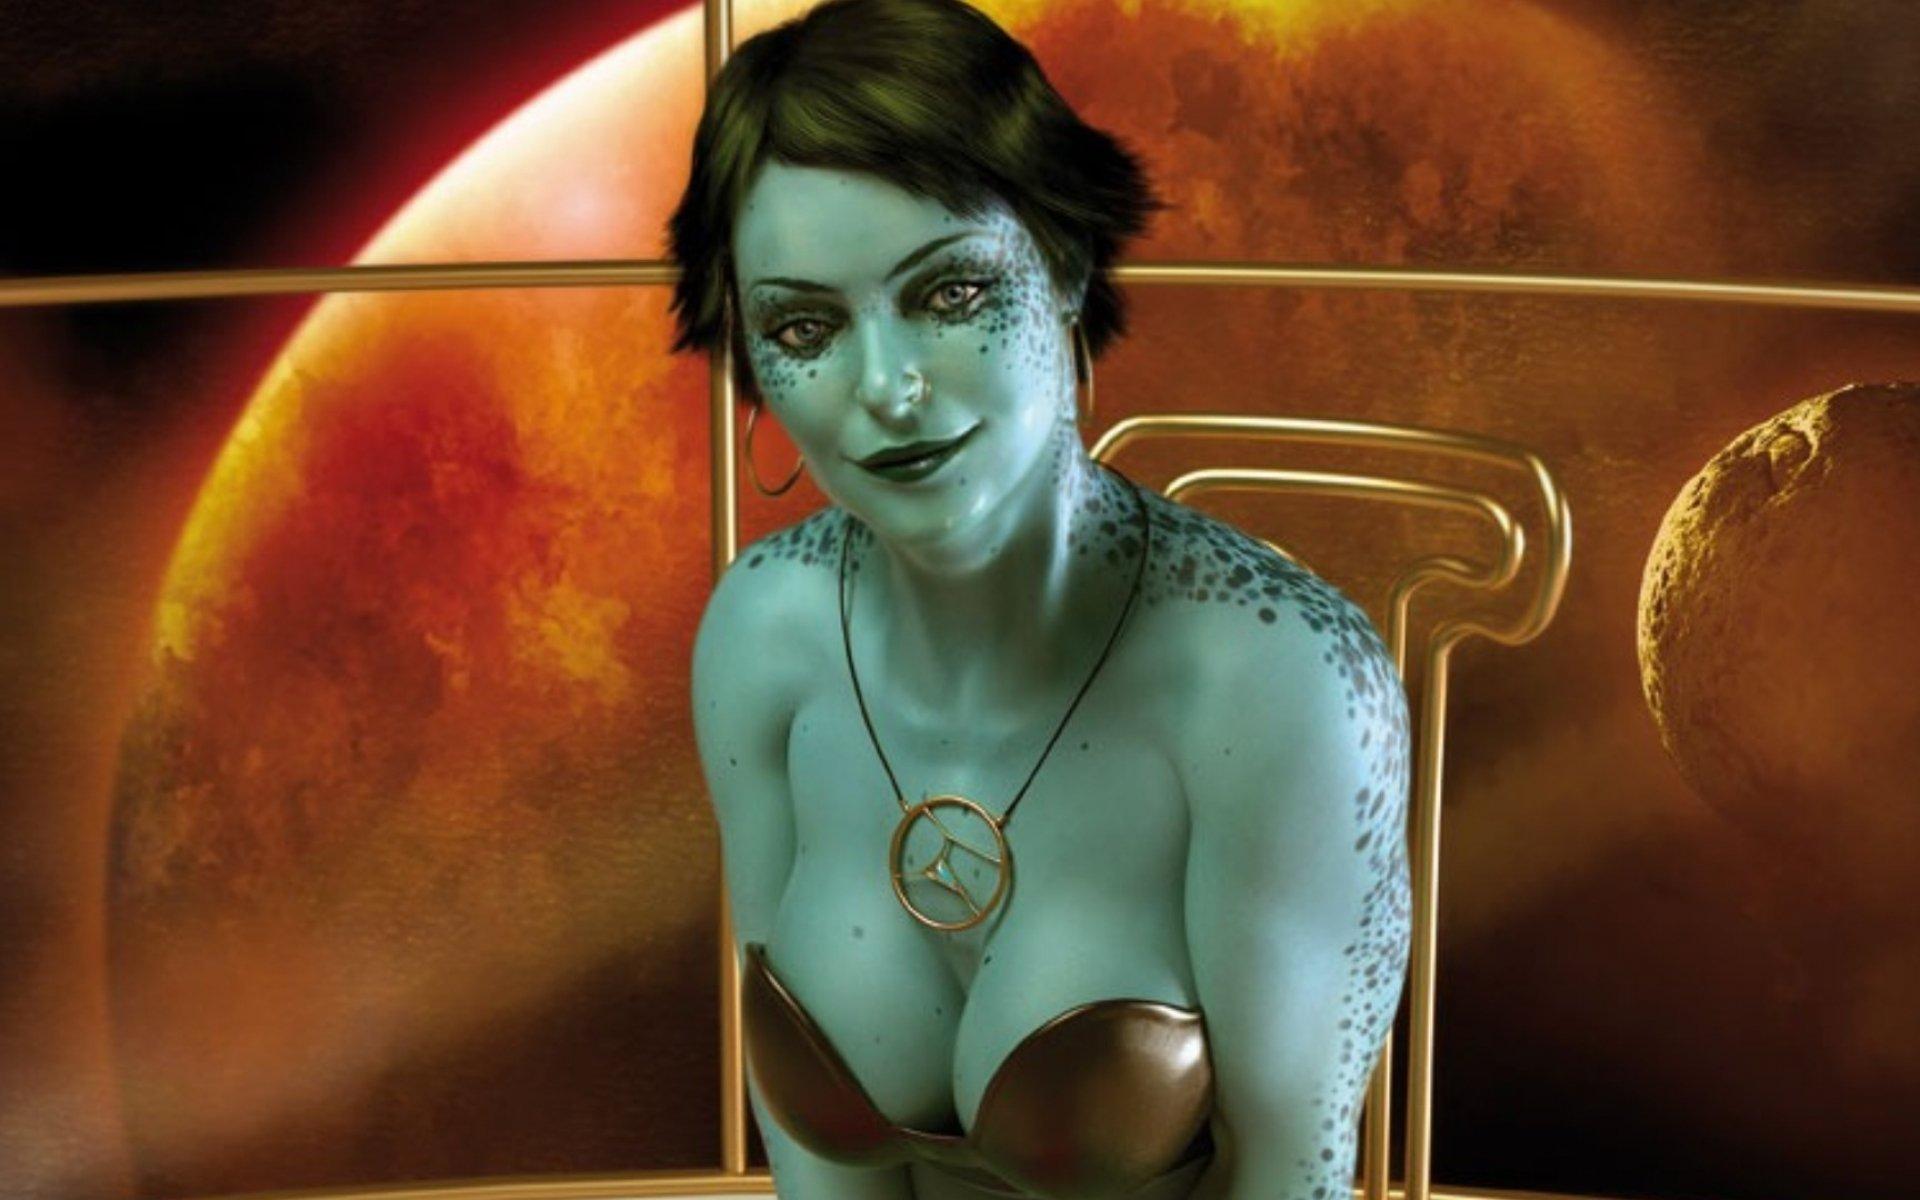 Sexy sci fi women nude image